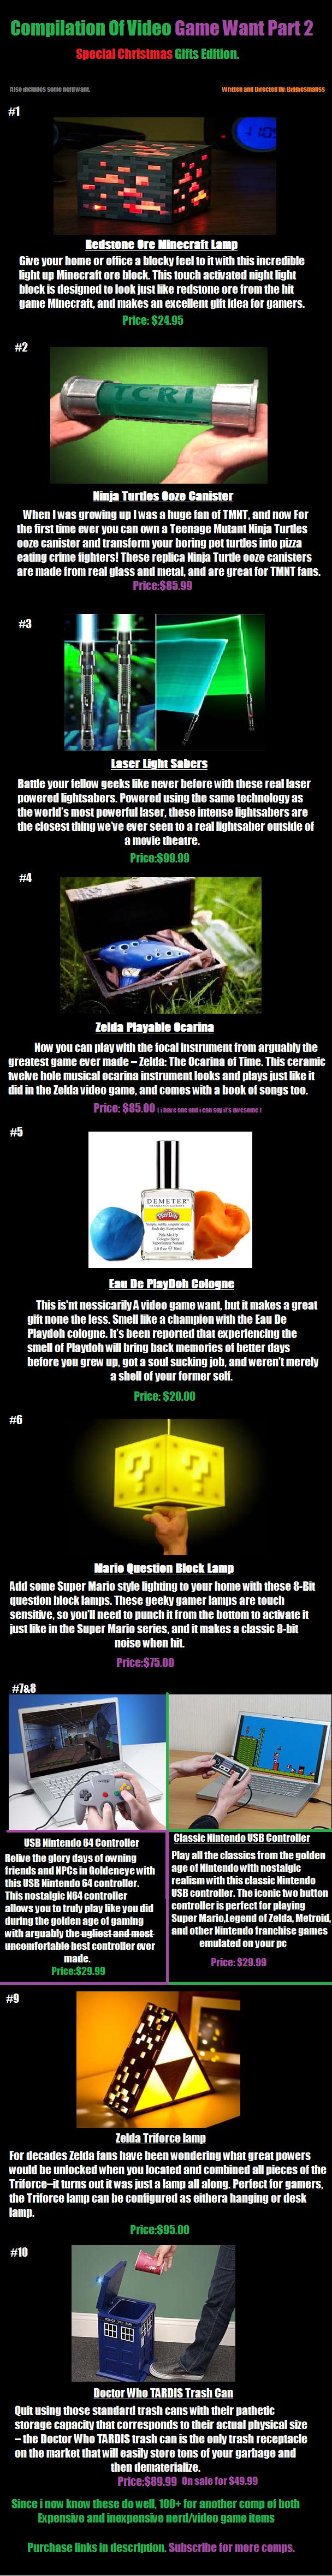 Part 2 Video game want comp. Ore Block www.thinkgeek.com/product/eea7/?cpg=cj&ref=&CJURL=&CJID=3363563 Ooze Canister www.etsy.com/listing/108649032/tmnt-replica